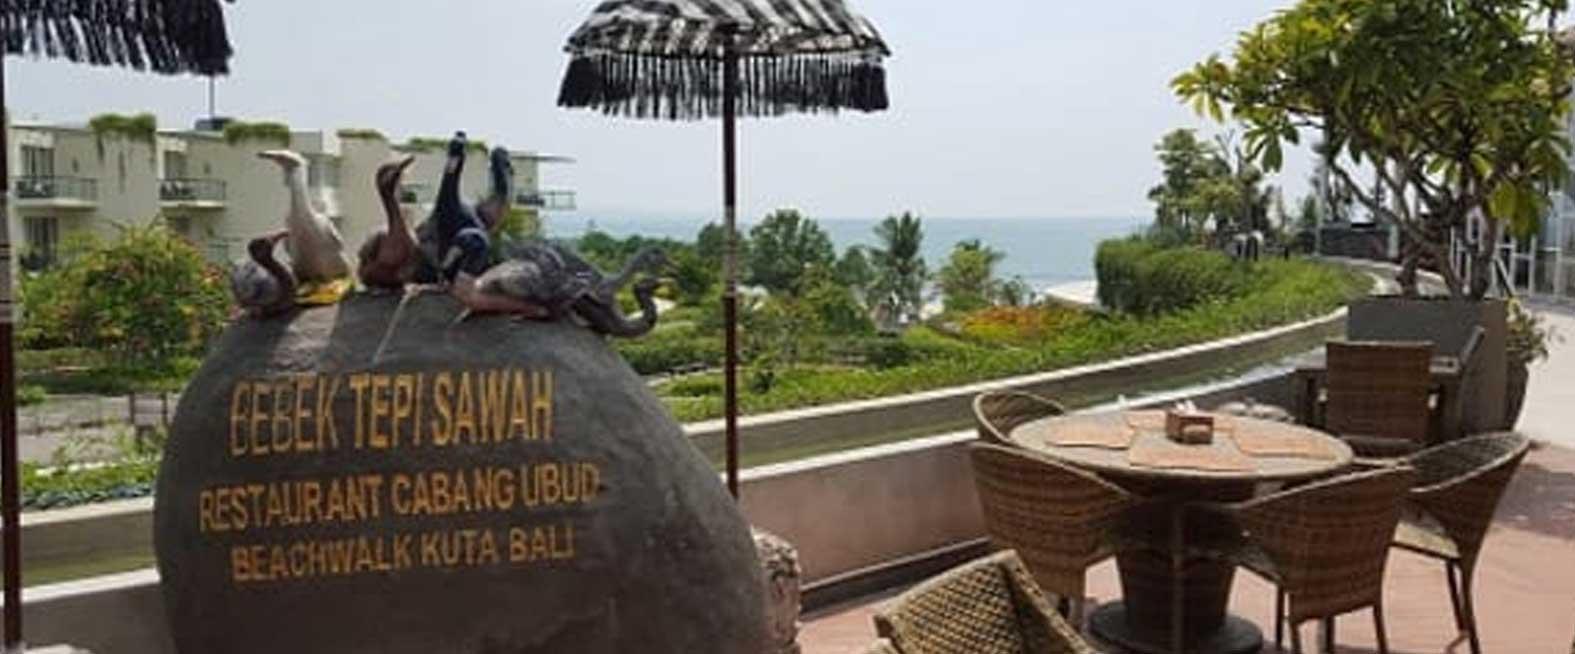 Bebek Tepi Sawah Beachwalk